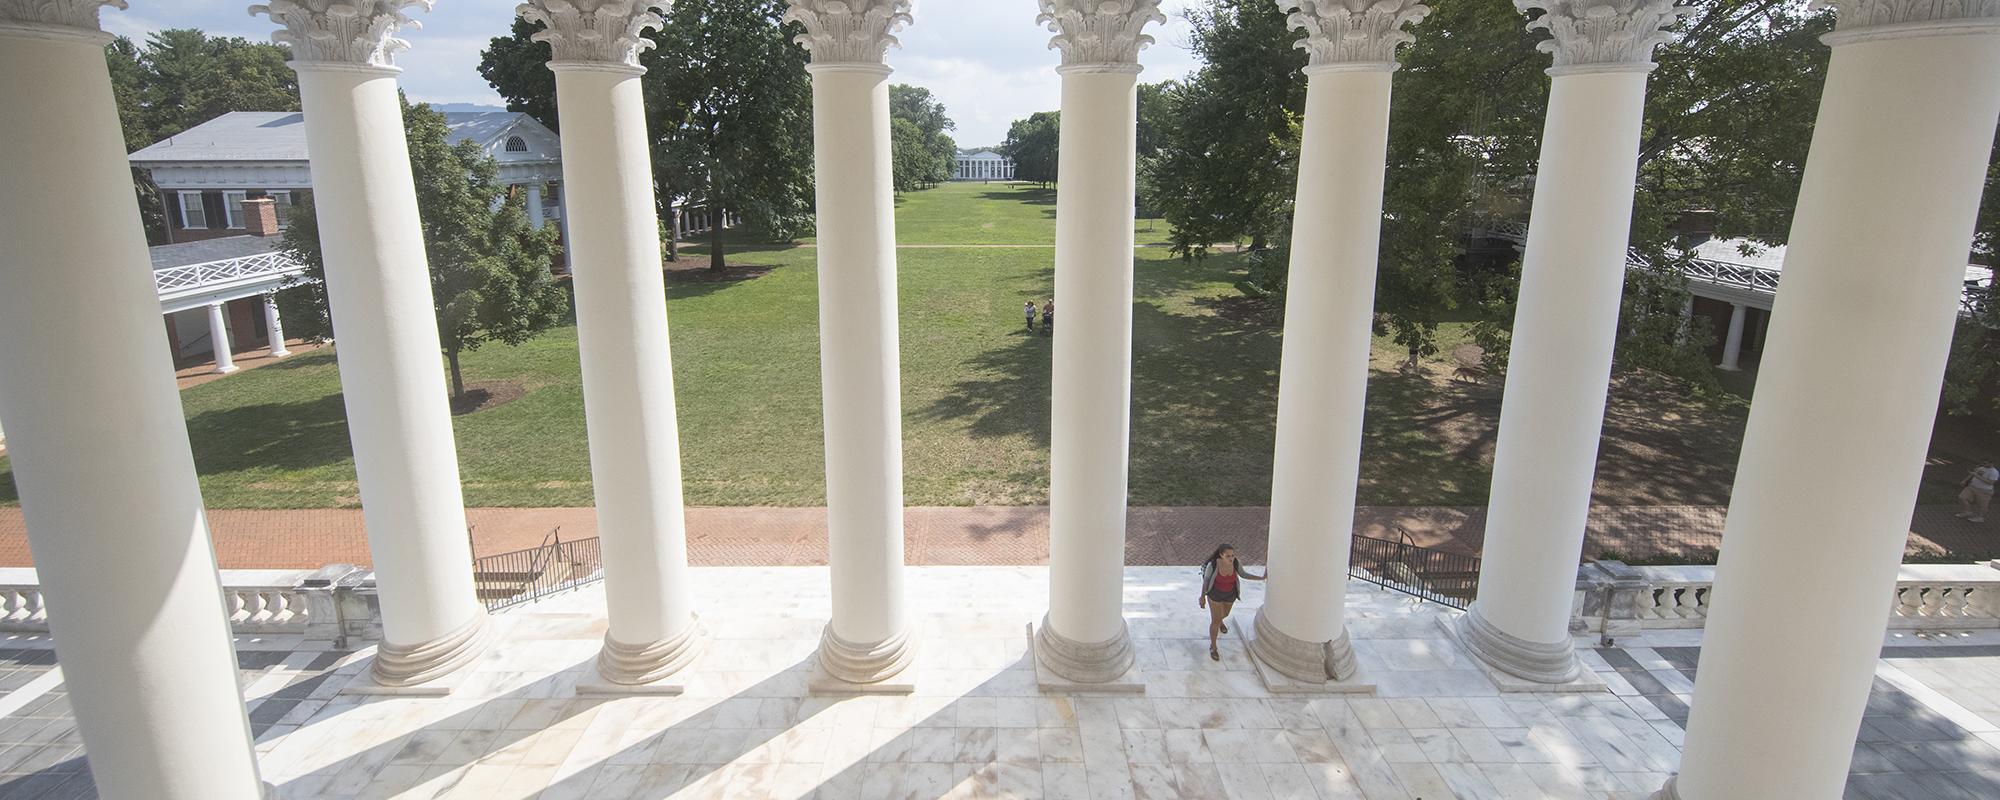 Rotunda Columns